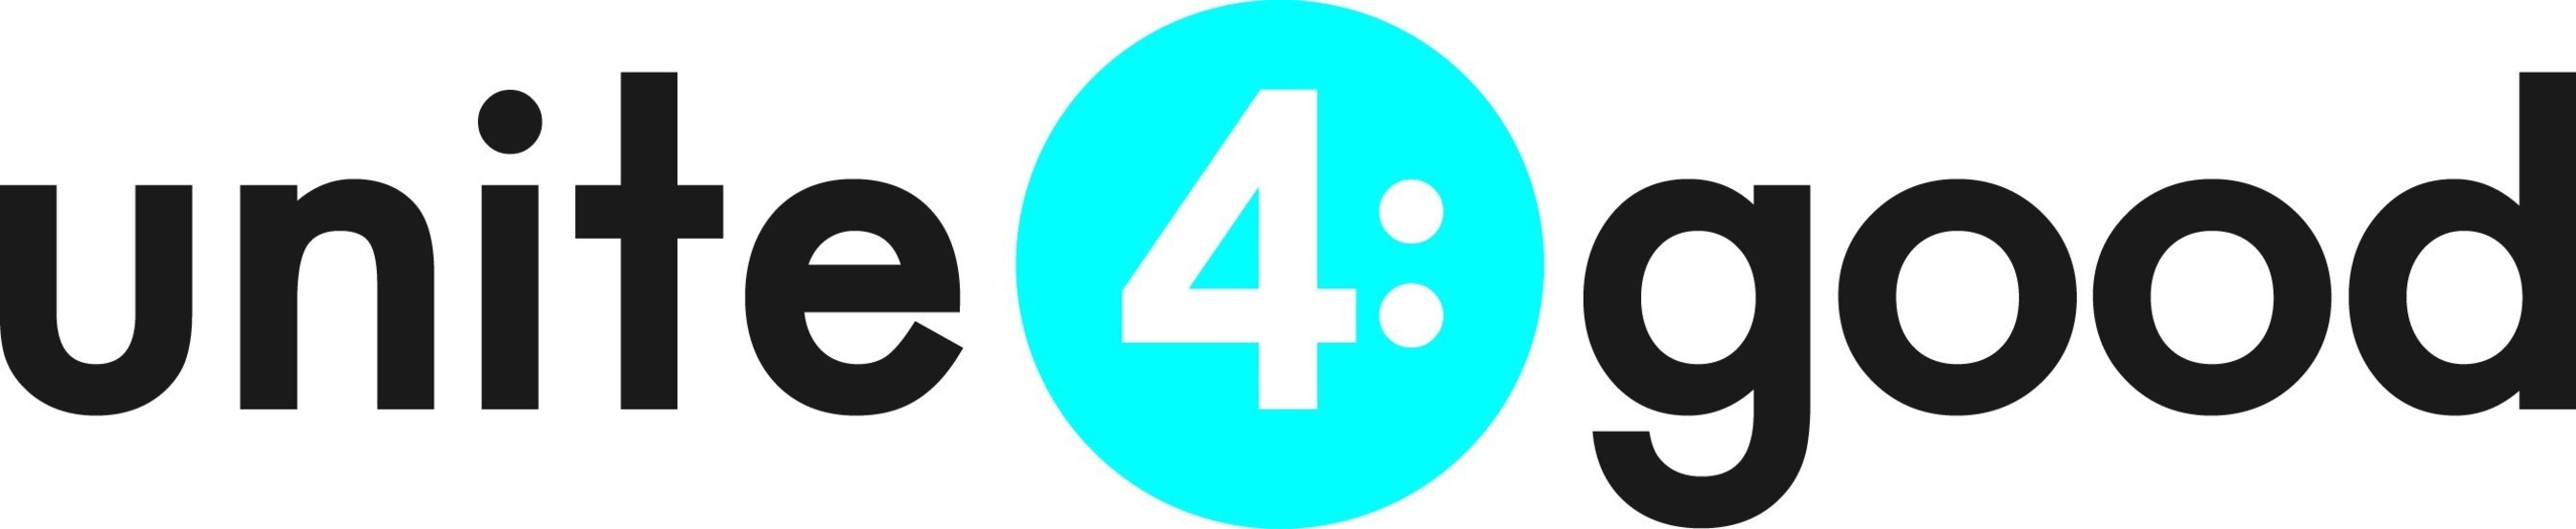 unite4:good logo (PRNewsFoto/unite4:good)